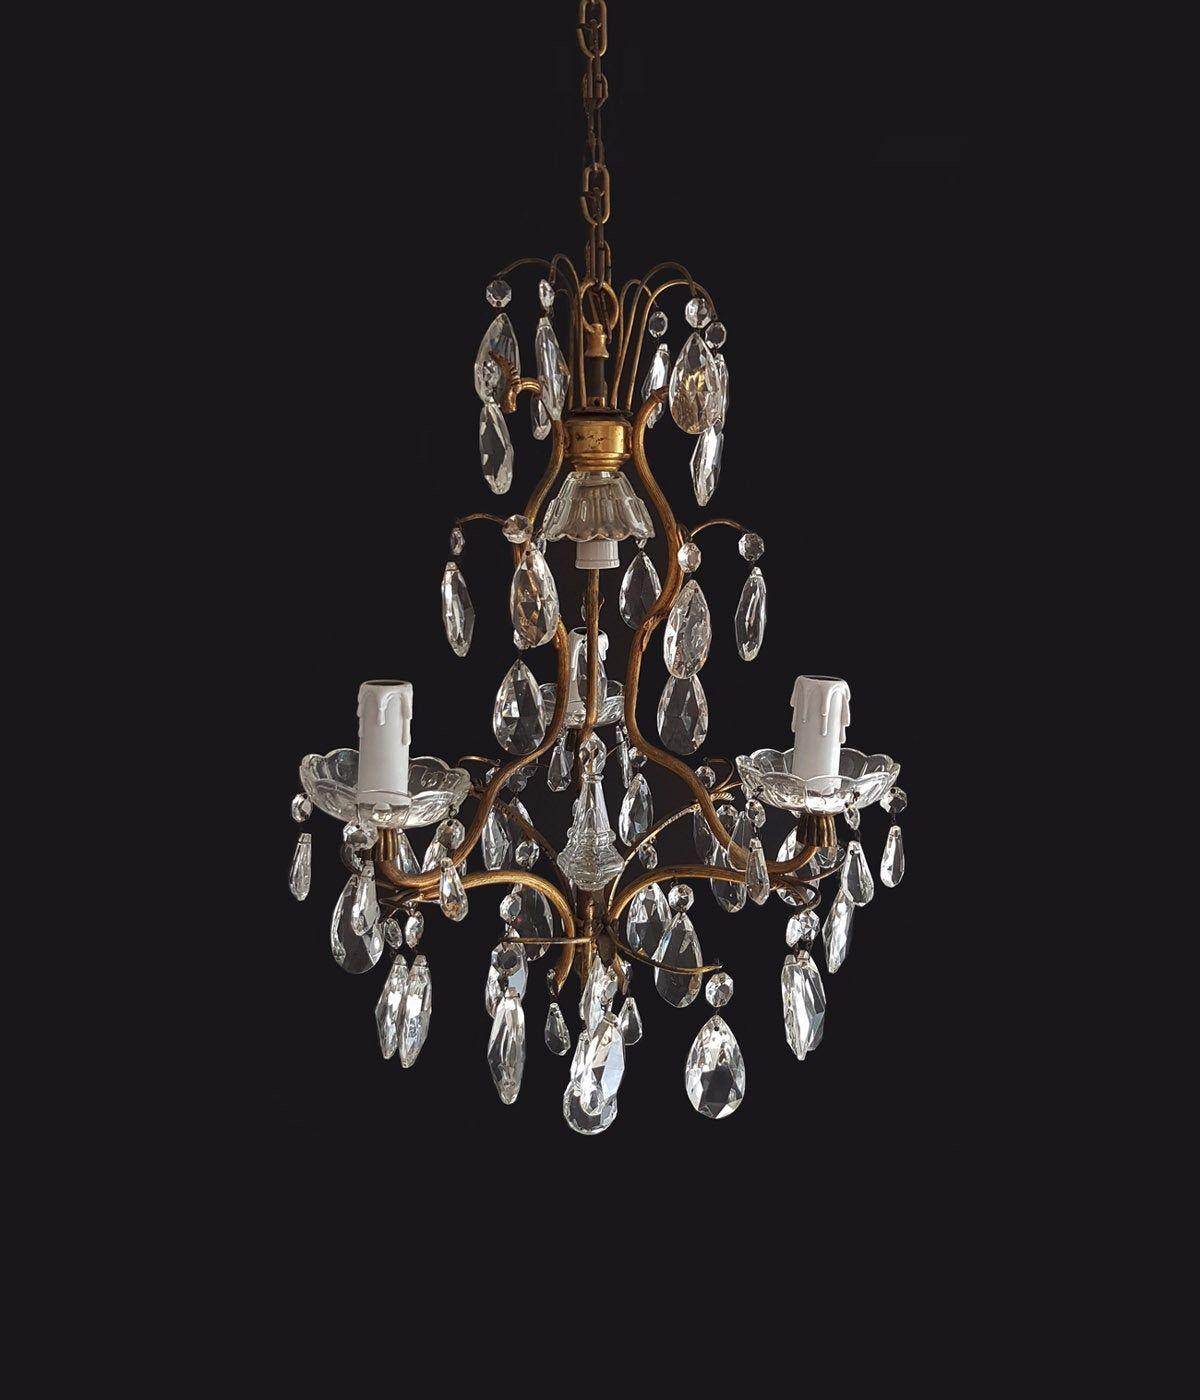 Antique Italian Crystal Chandelier 4 Lights Rococo Style Crystal